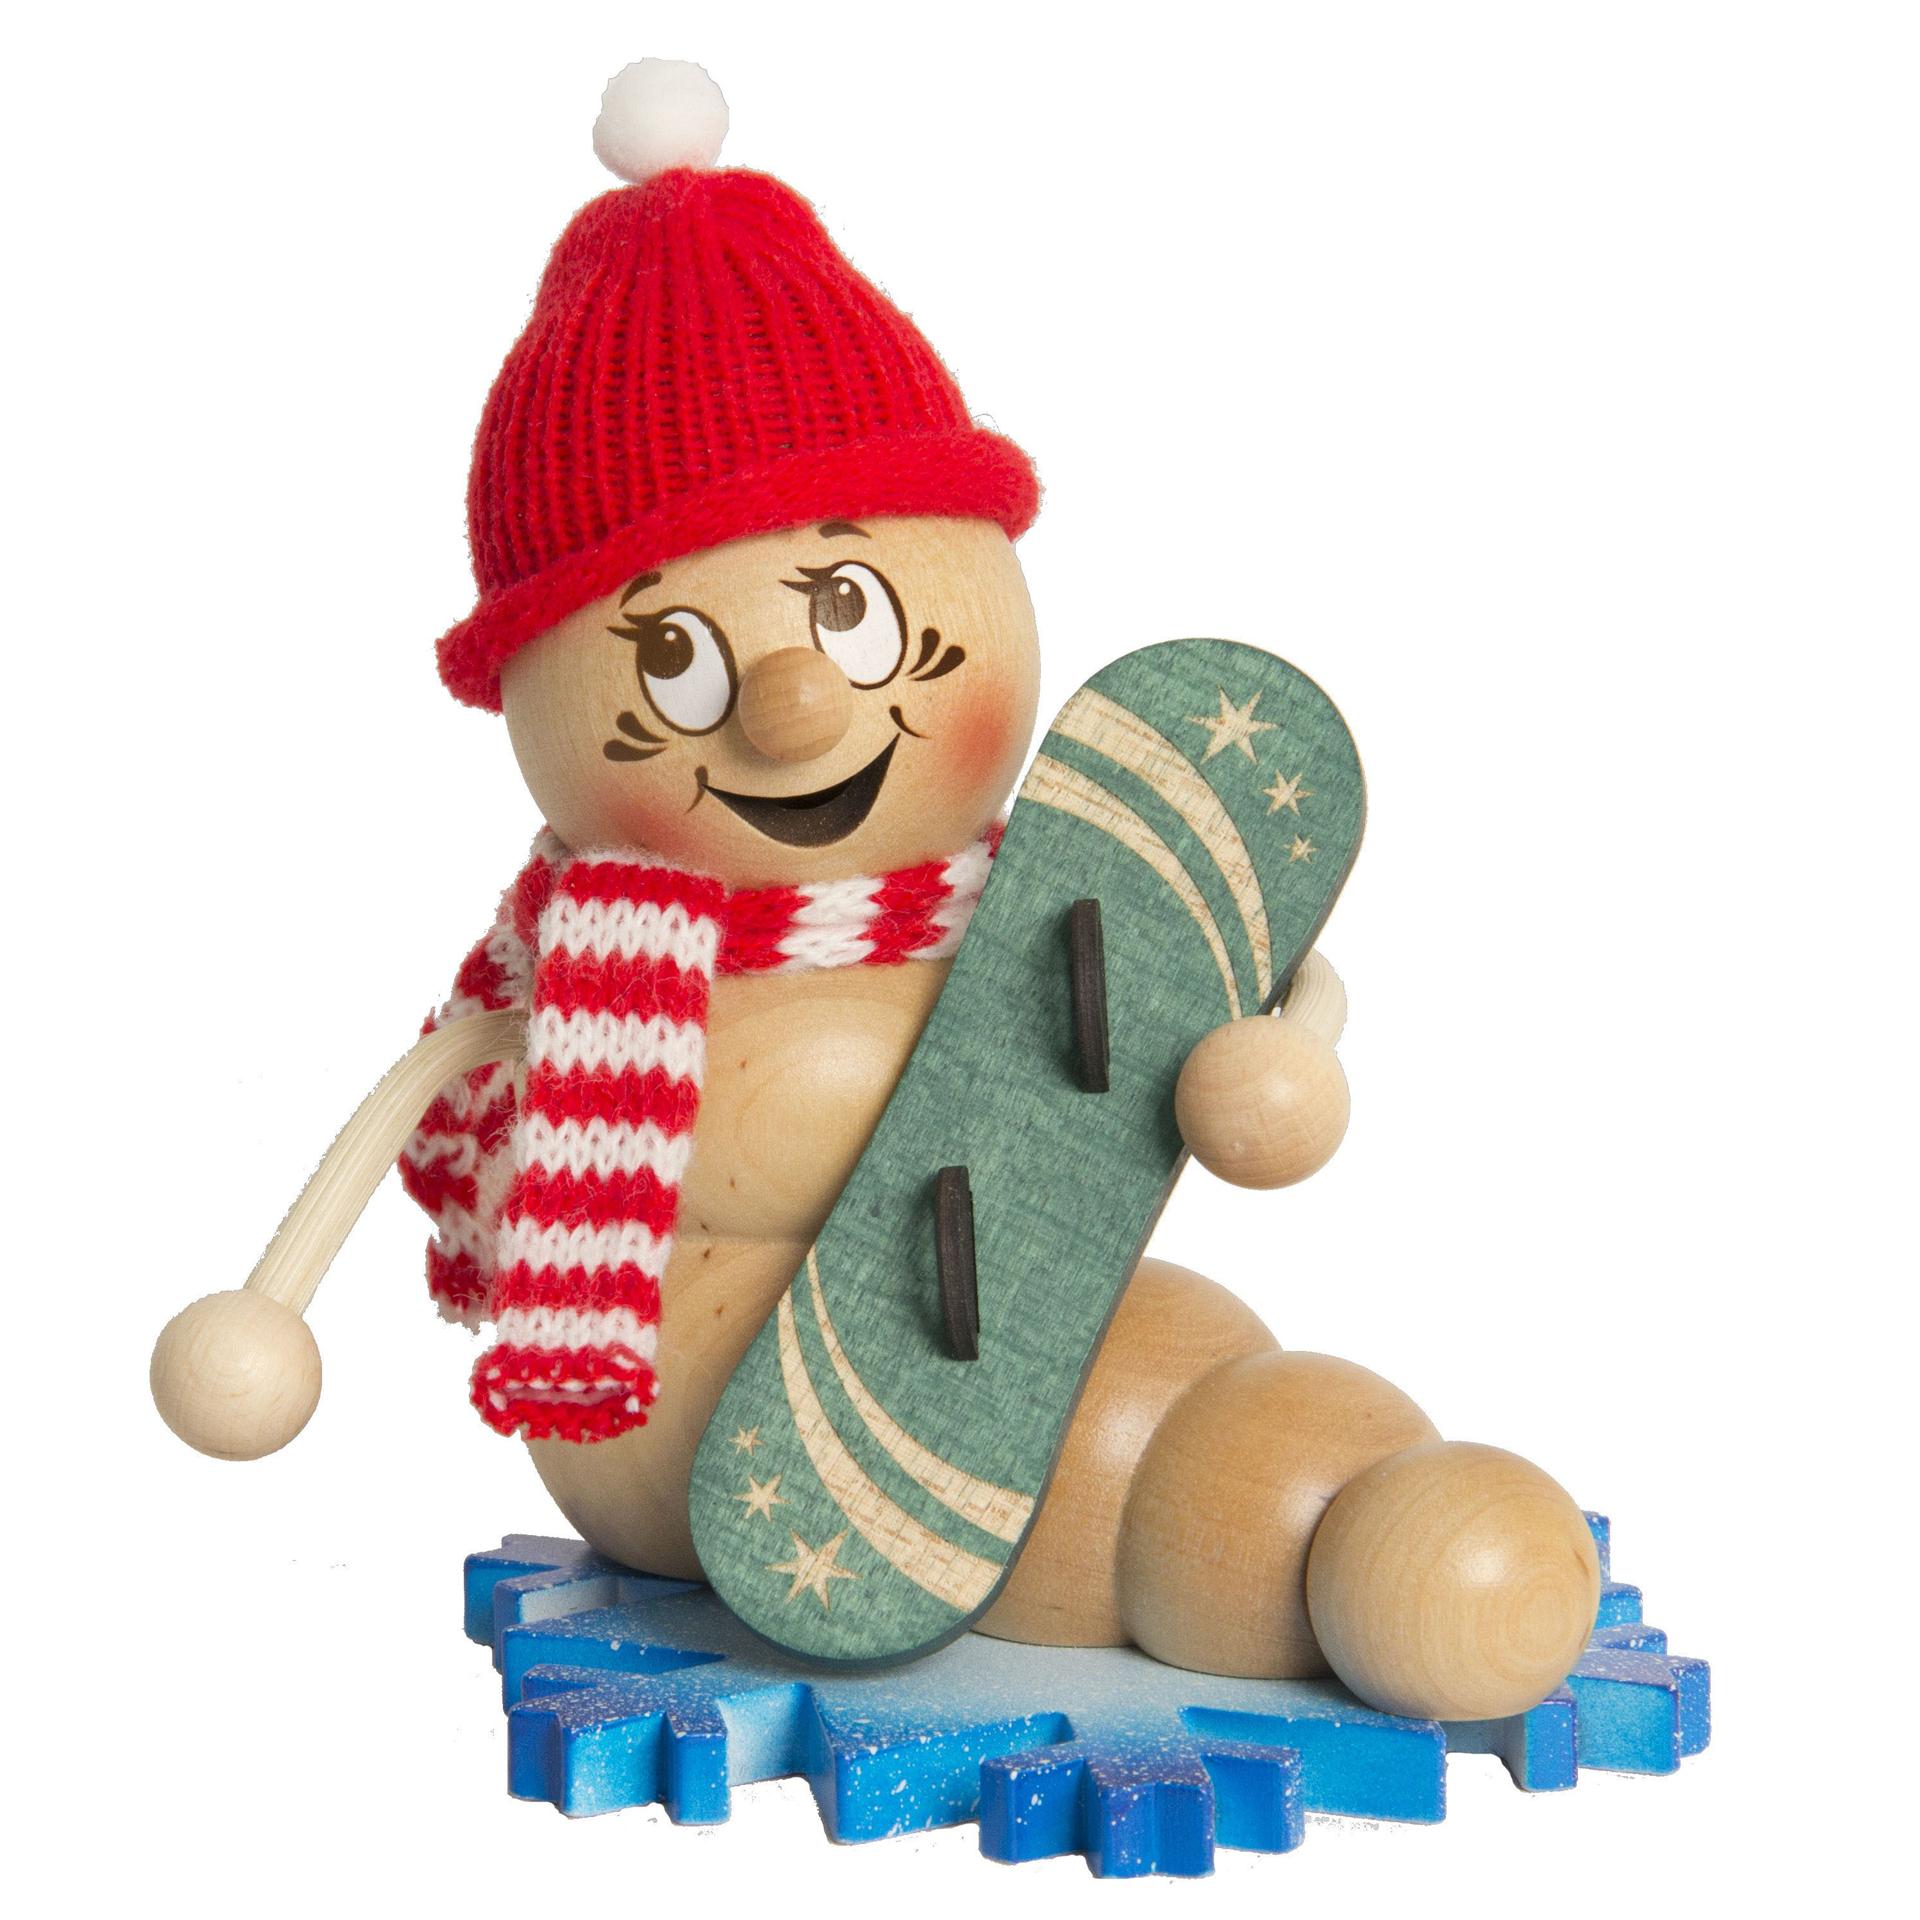 Snowboard Rudi